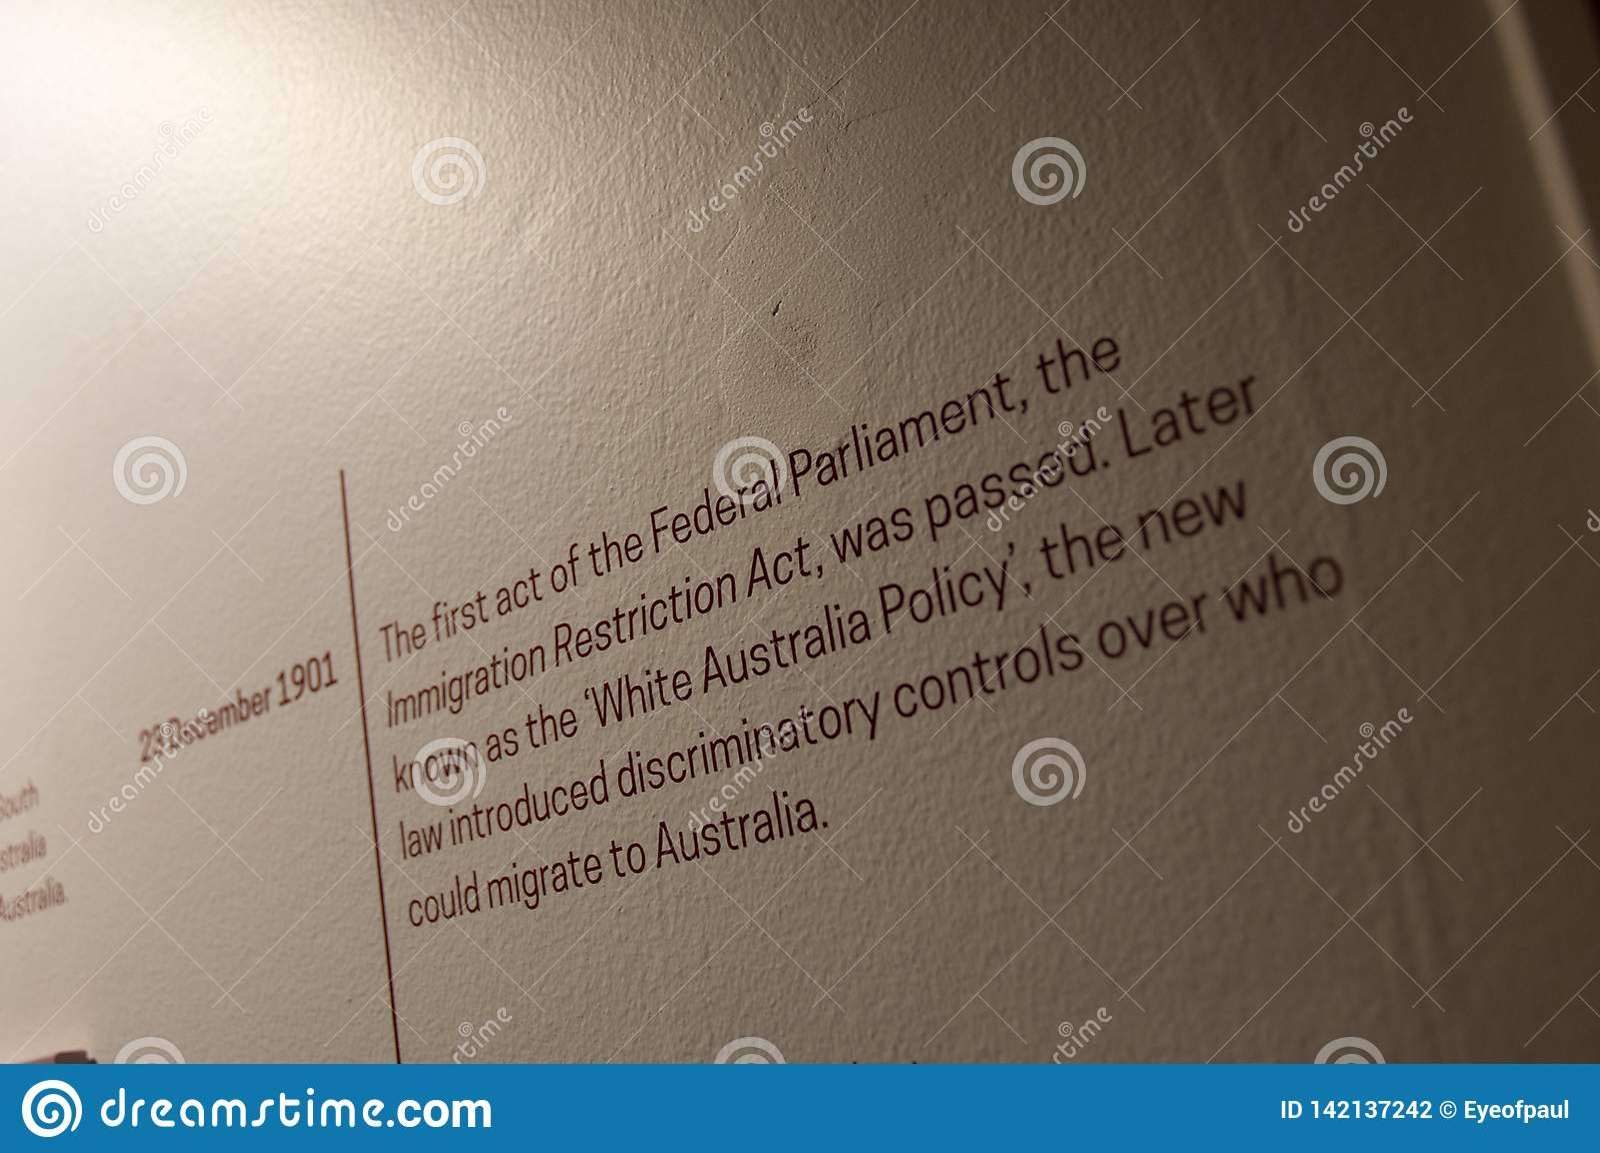 MELBOURNE, AUSTRALIA - JULY 26, 2018: White Australia Policy on 23 December 1901 explanation text on white wall